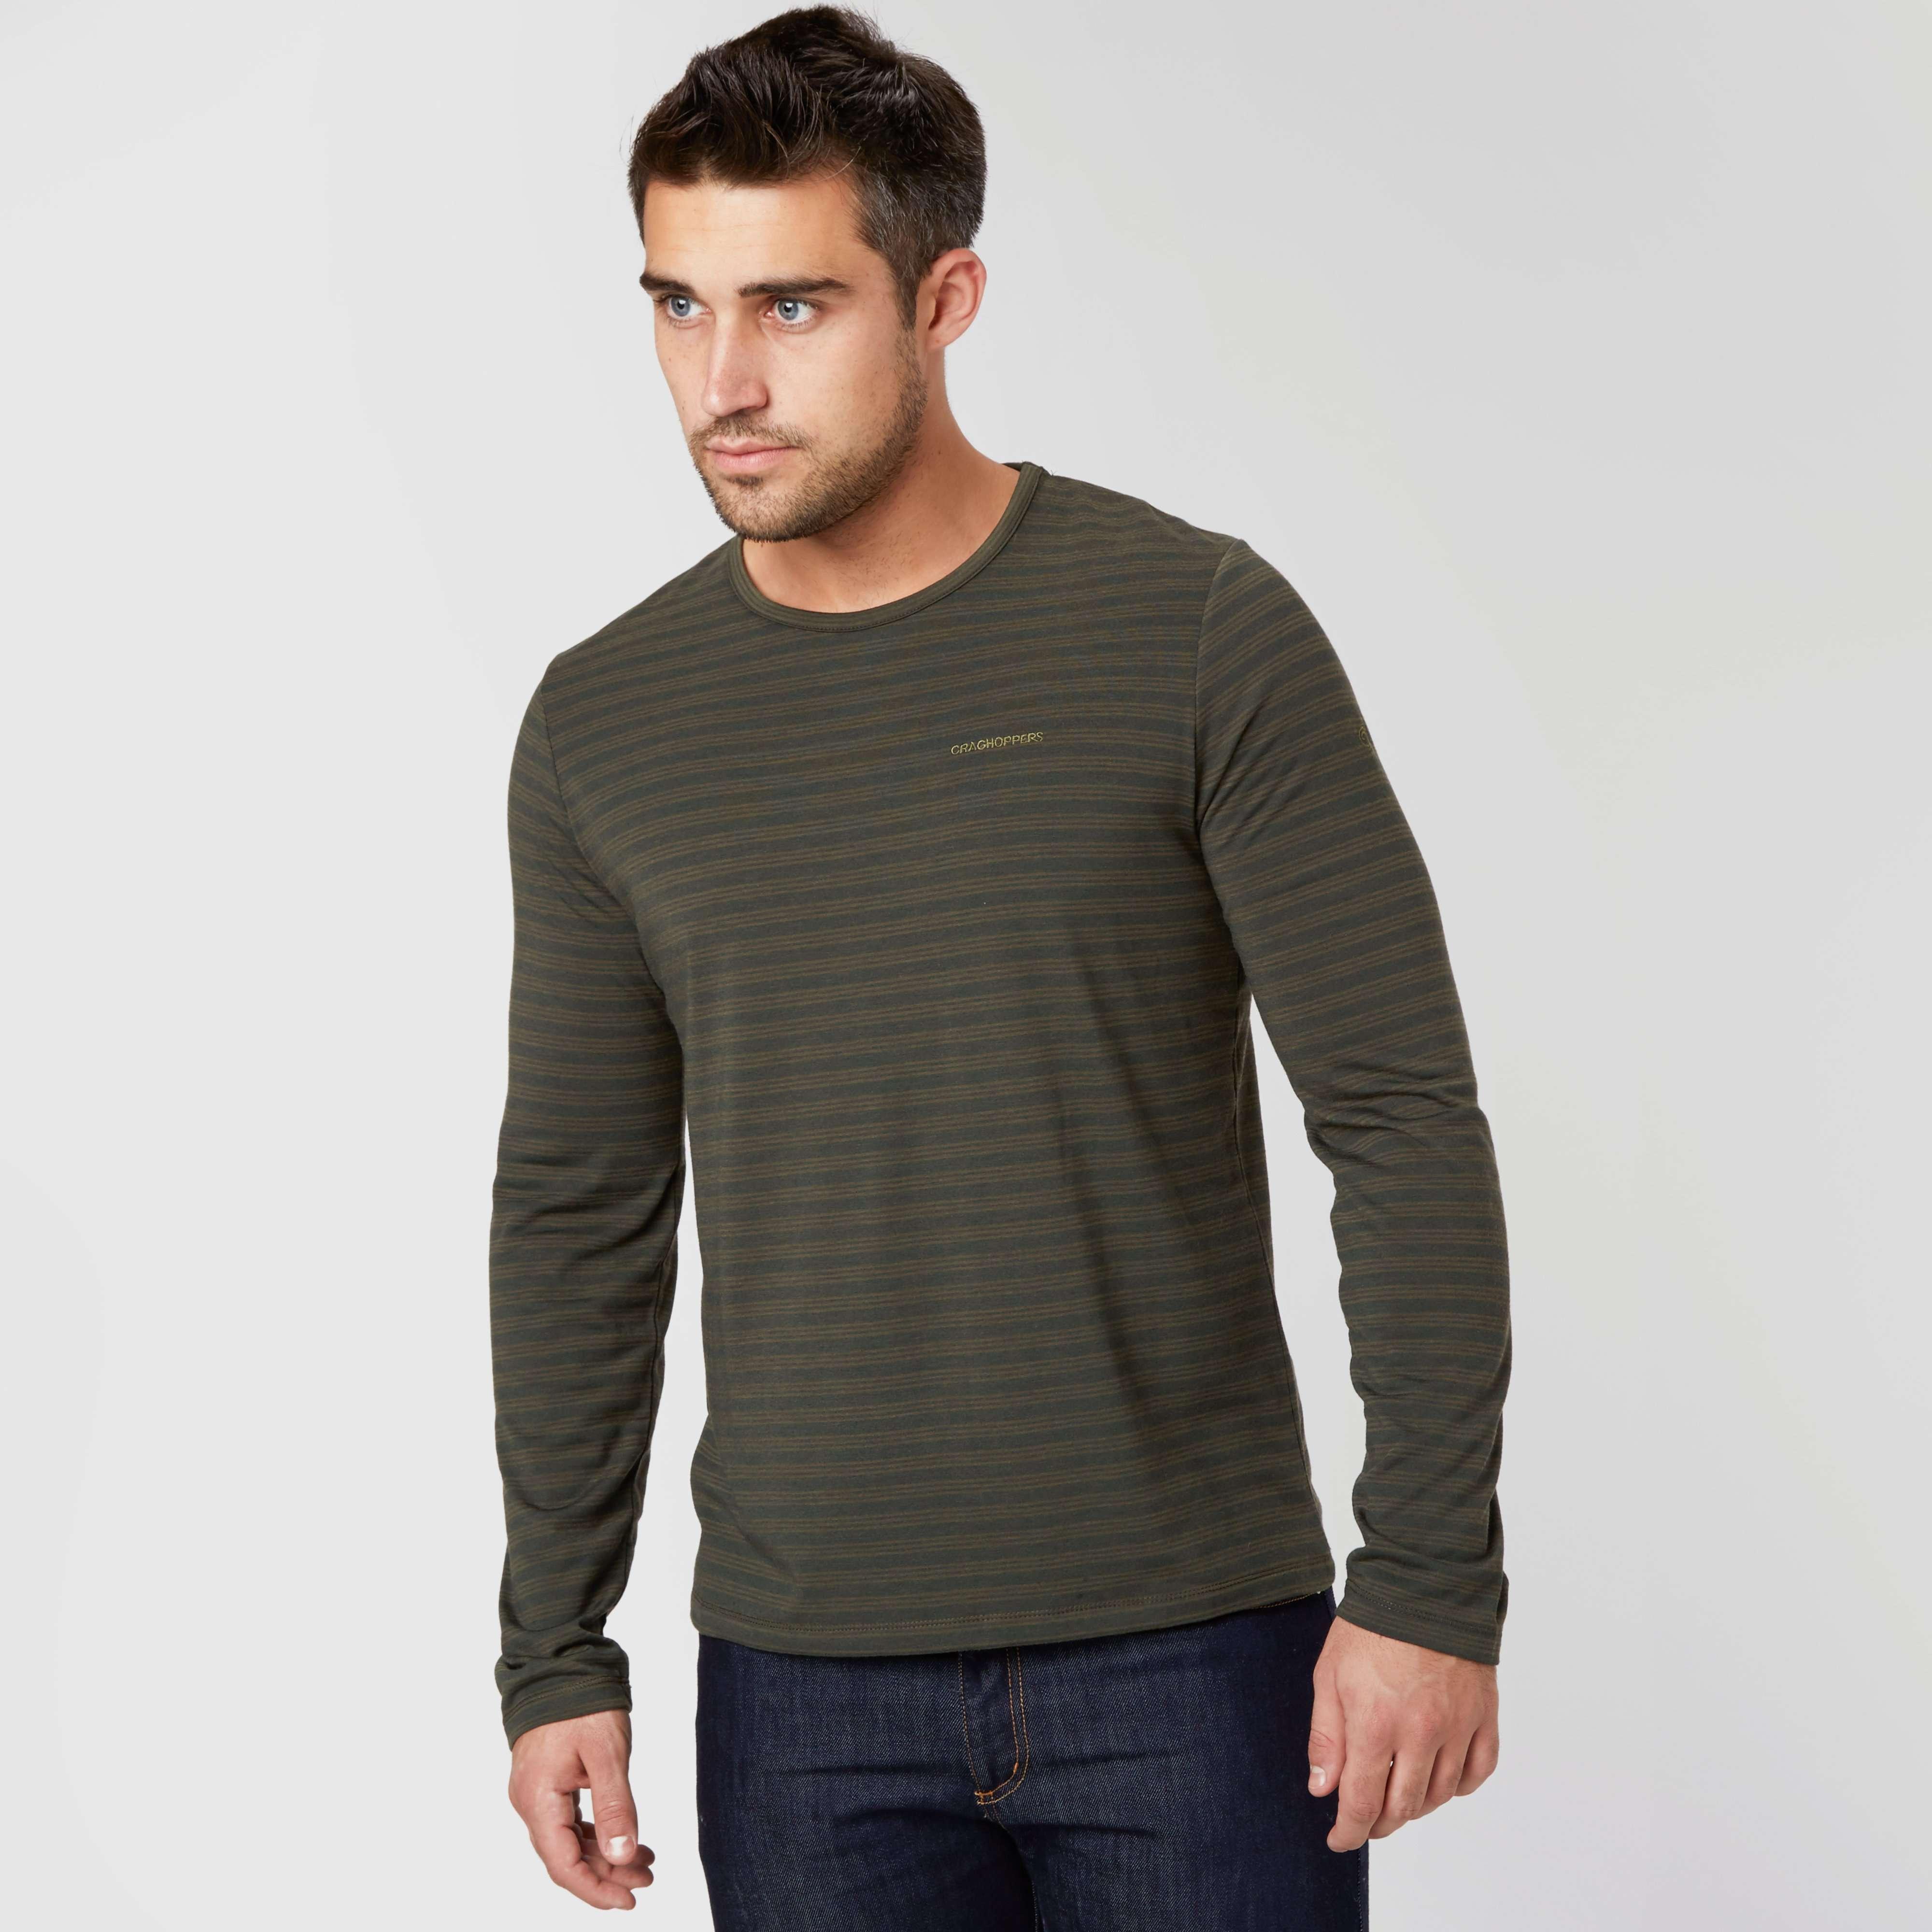 CRAGHOPPERS Men's Bentley Long-sleeve T-shirt